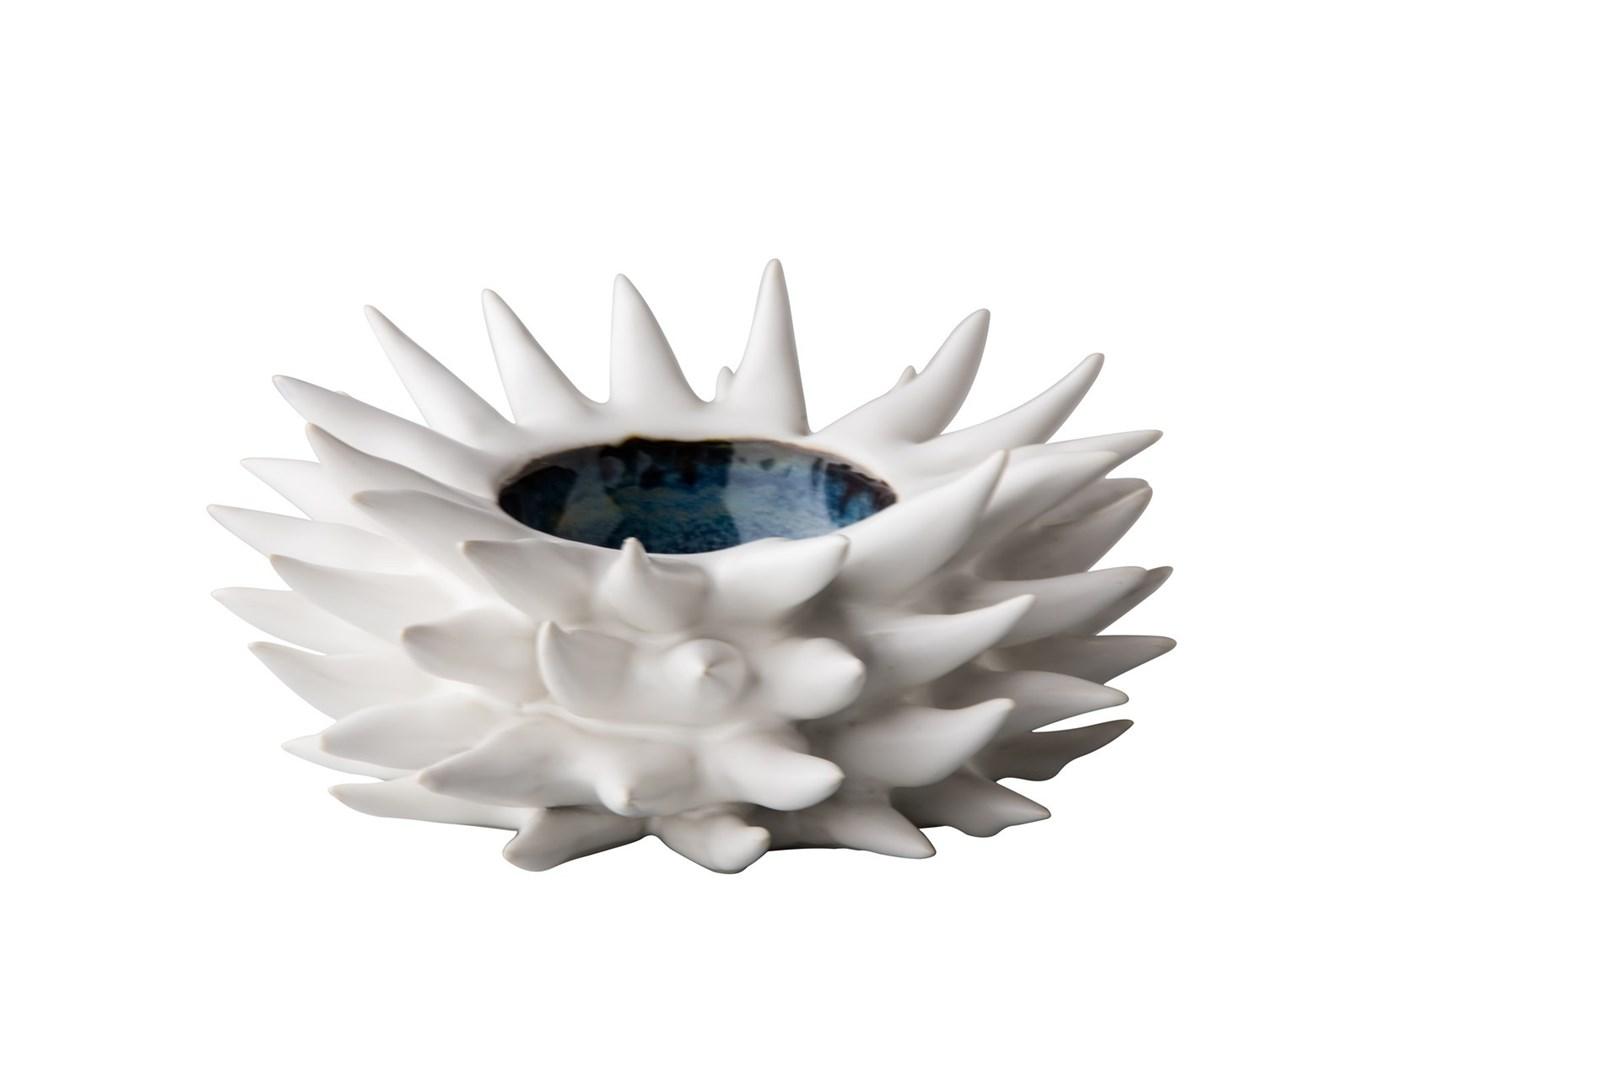 Productafbeelding Zee egel 18 cm